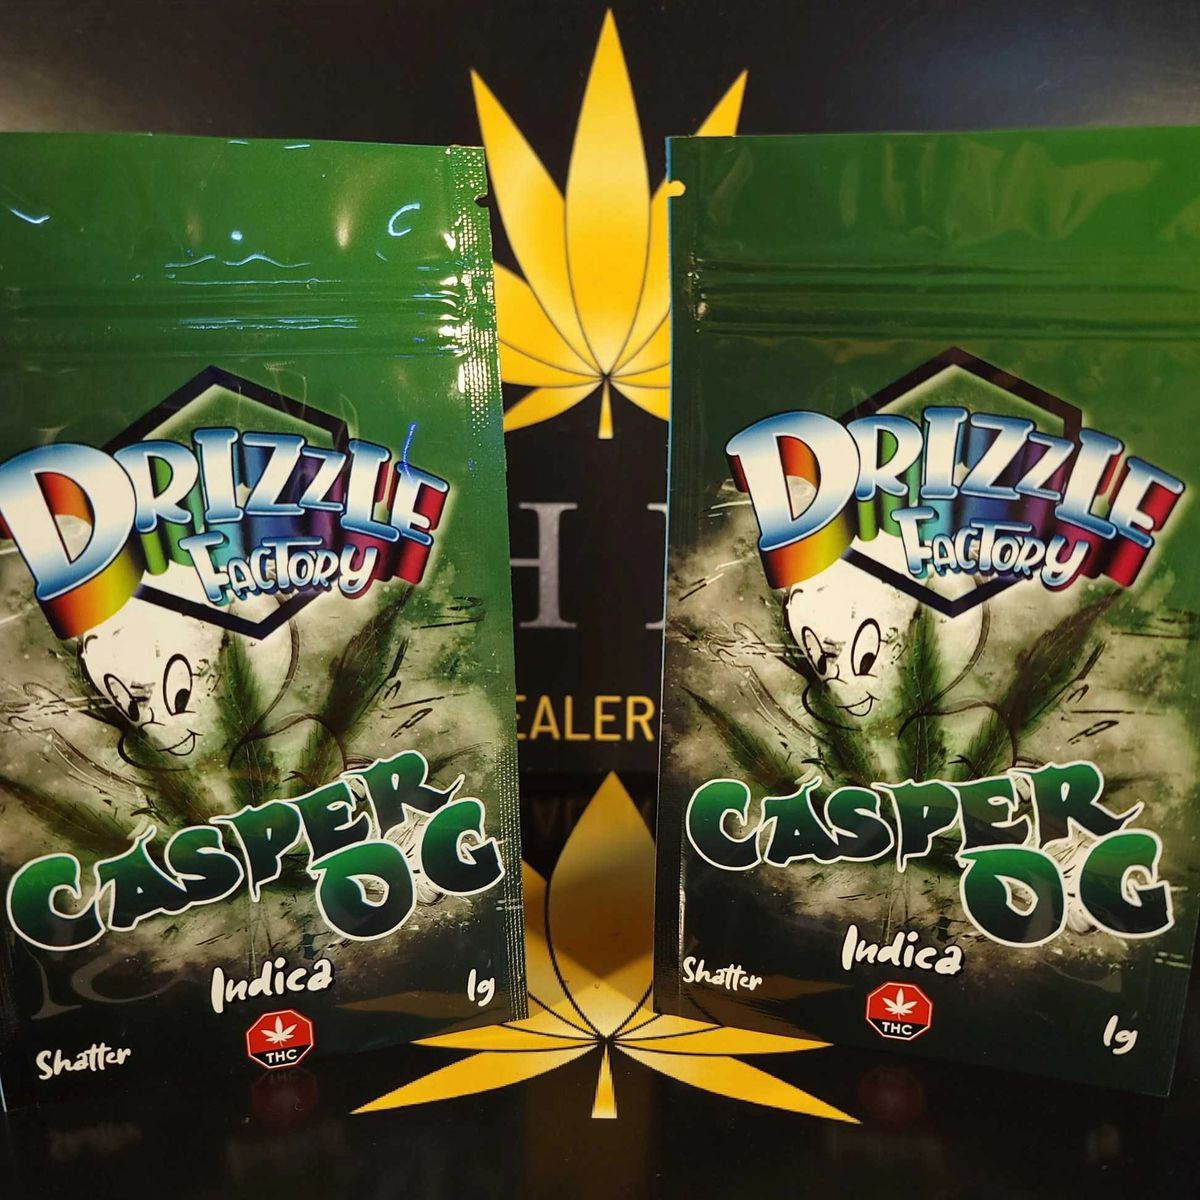 Casper OG Shatter by Drizzle Factory $25 each or 2 for $40